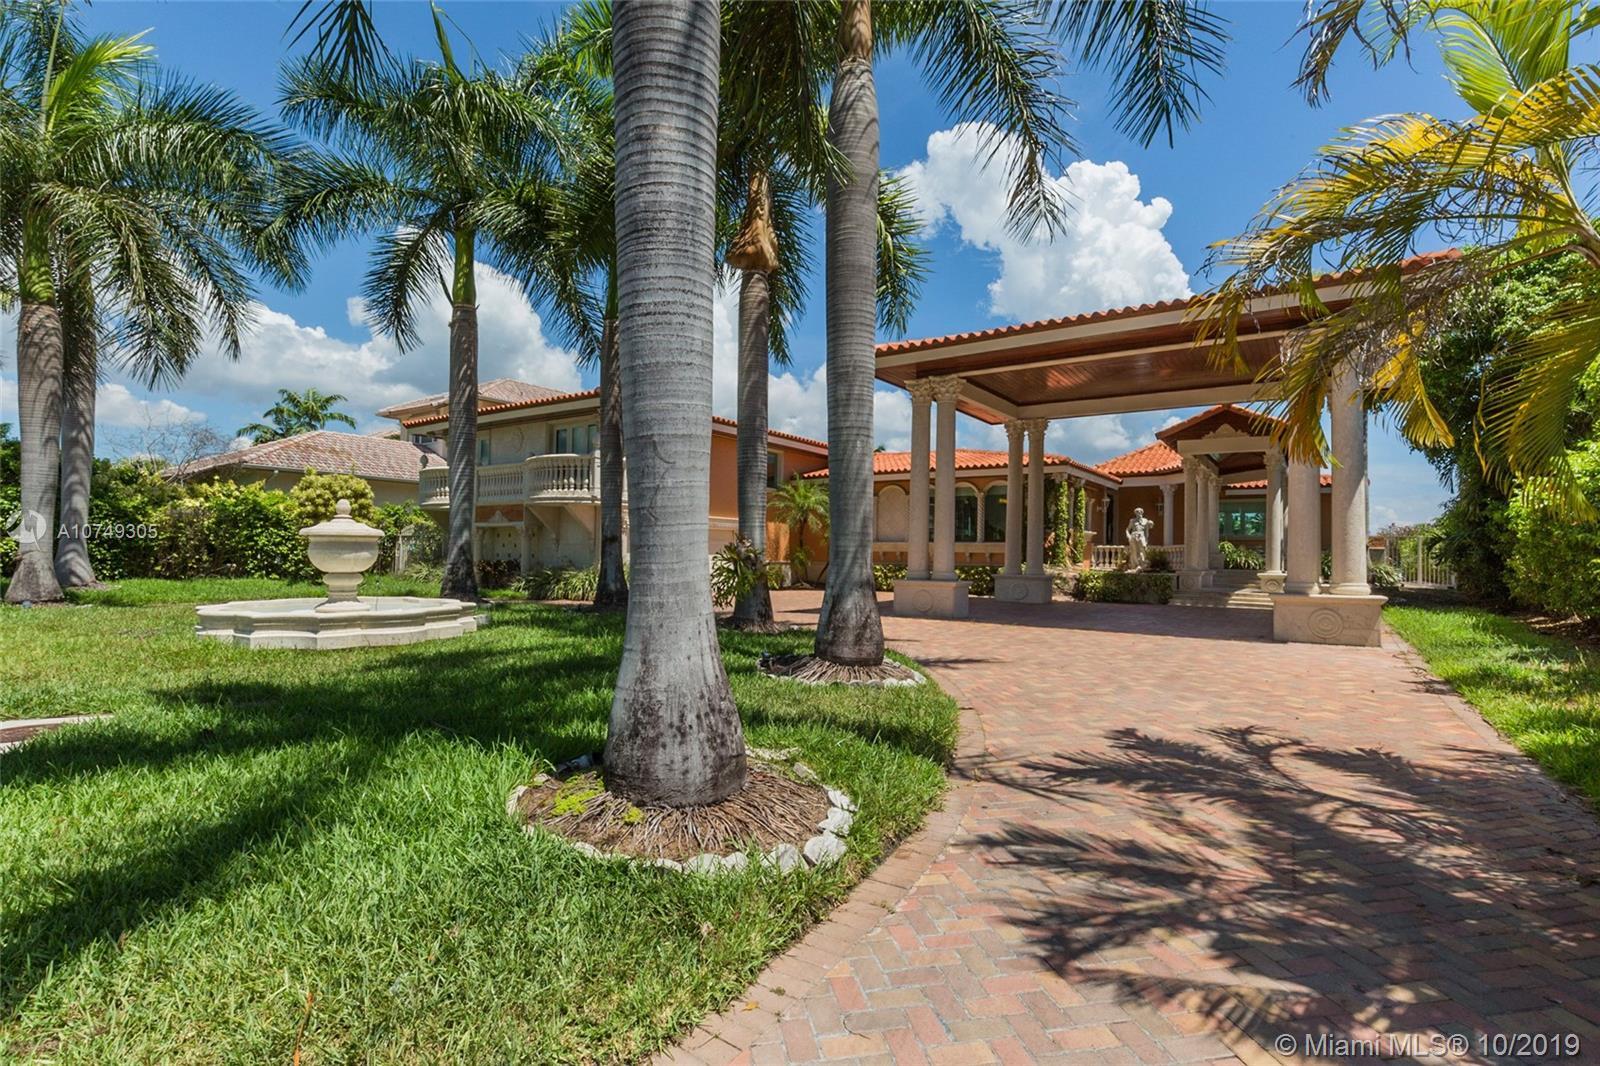 Аренда квартиры по адресу 1249 Biscaya Dr, Surfside, FL 33154 в США